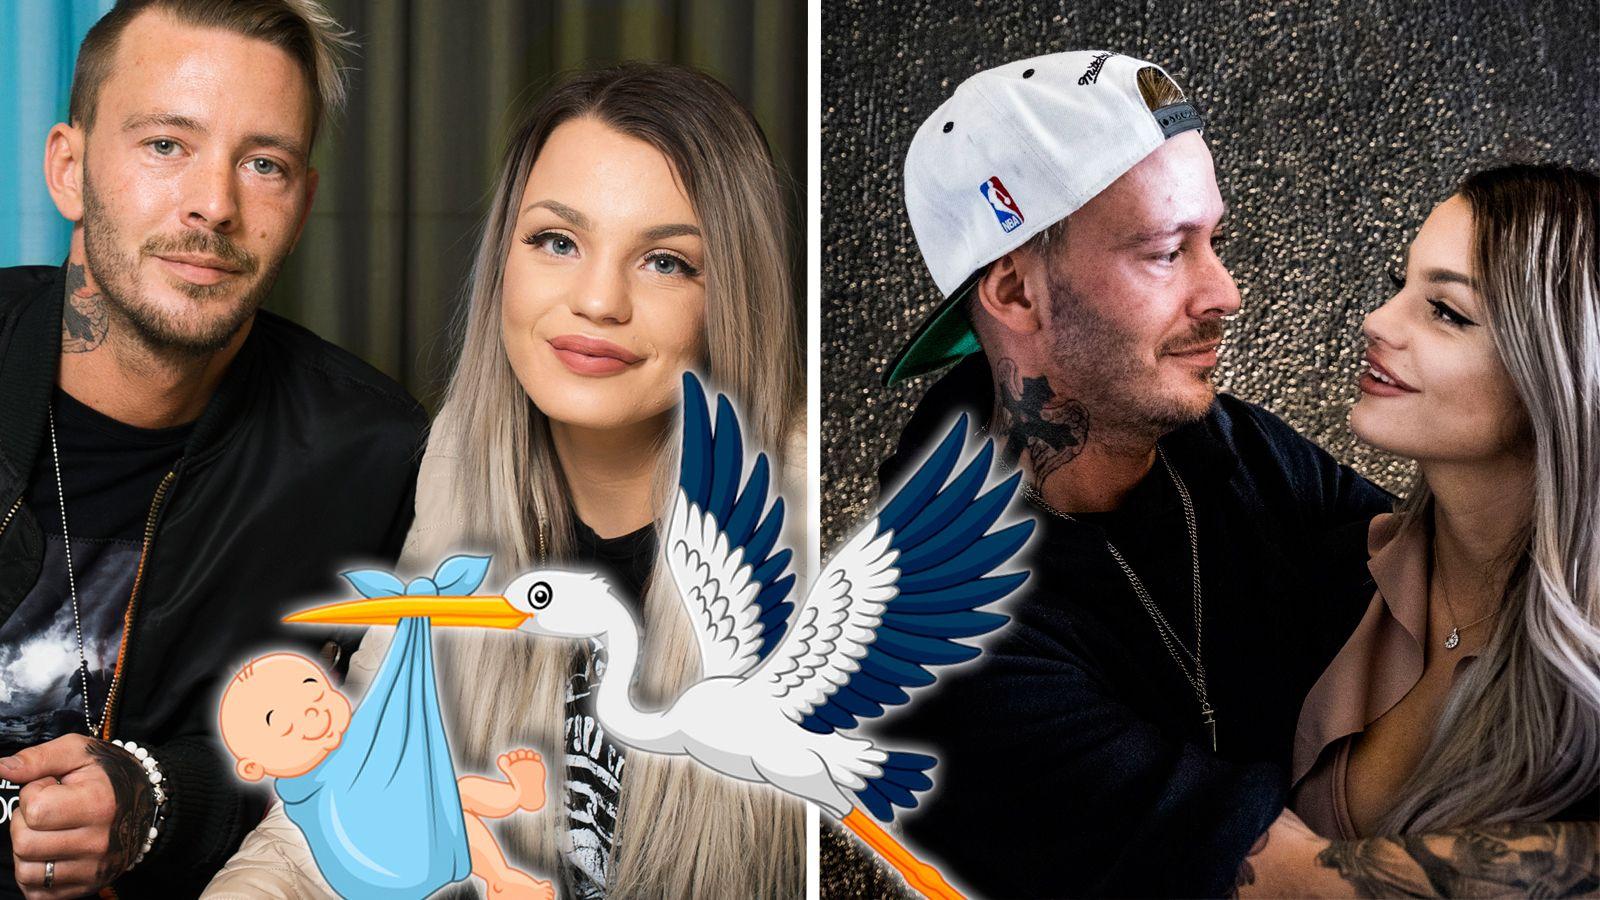 Joakim Lundell Joakim Och Jonna Lundell Stams Pa 400 000 Kronor Stockholm Alex